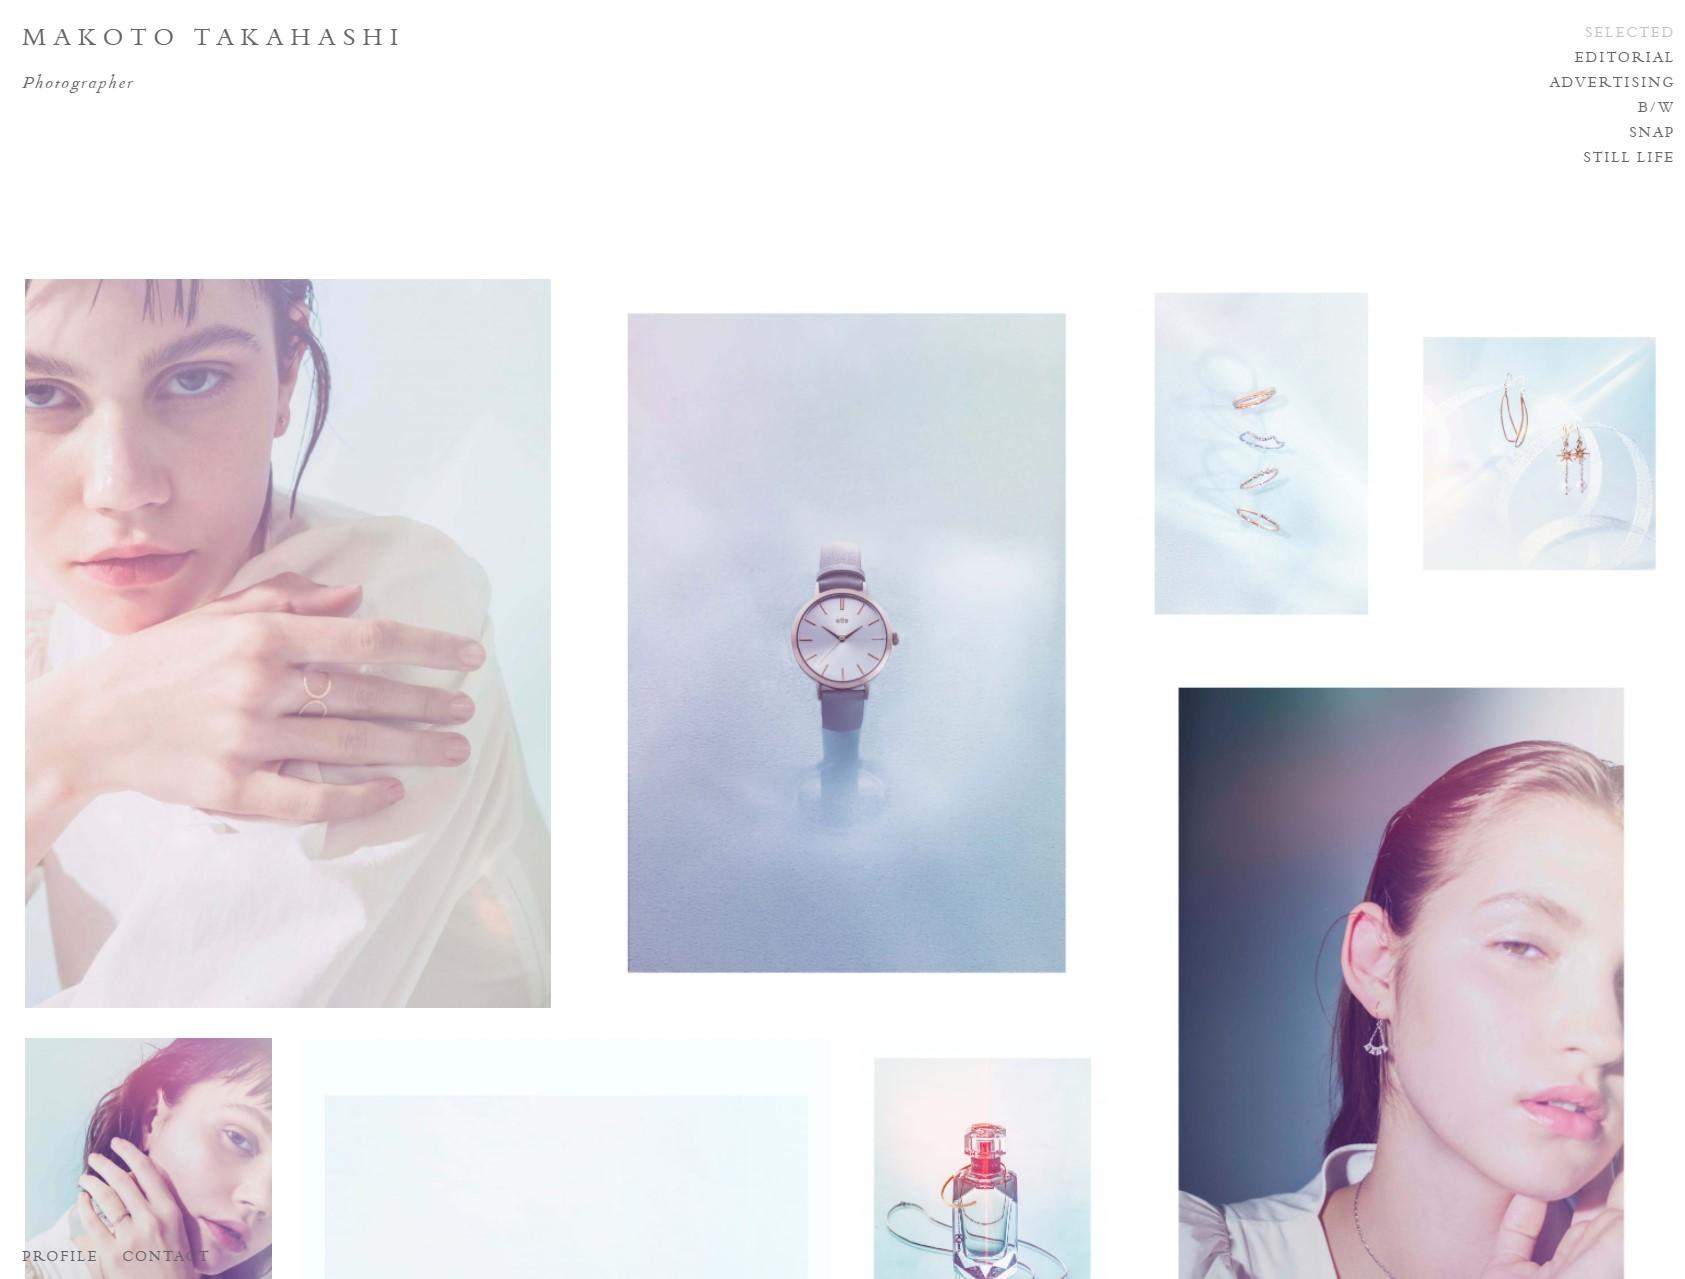 MAKOTO TAKAHASHI - PHOTOGRAPHER